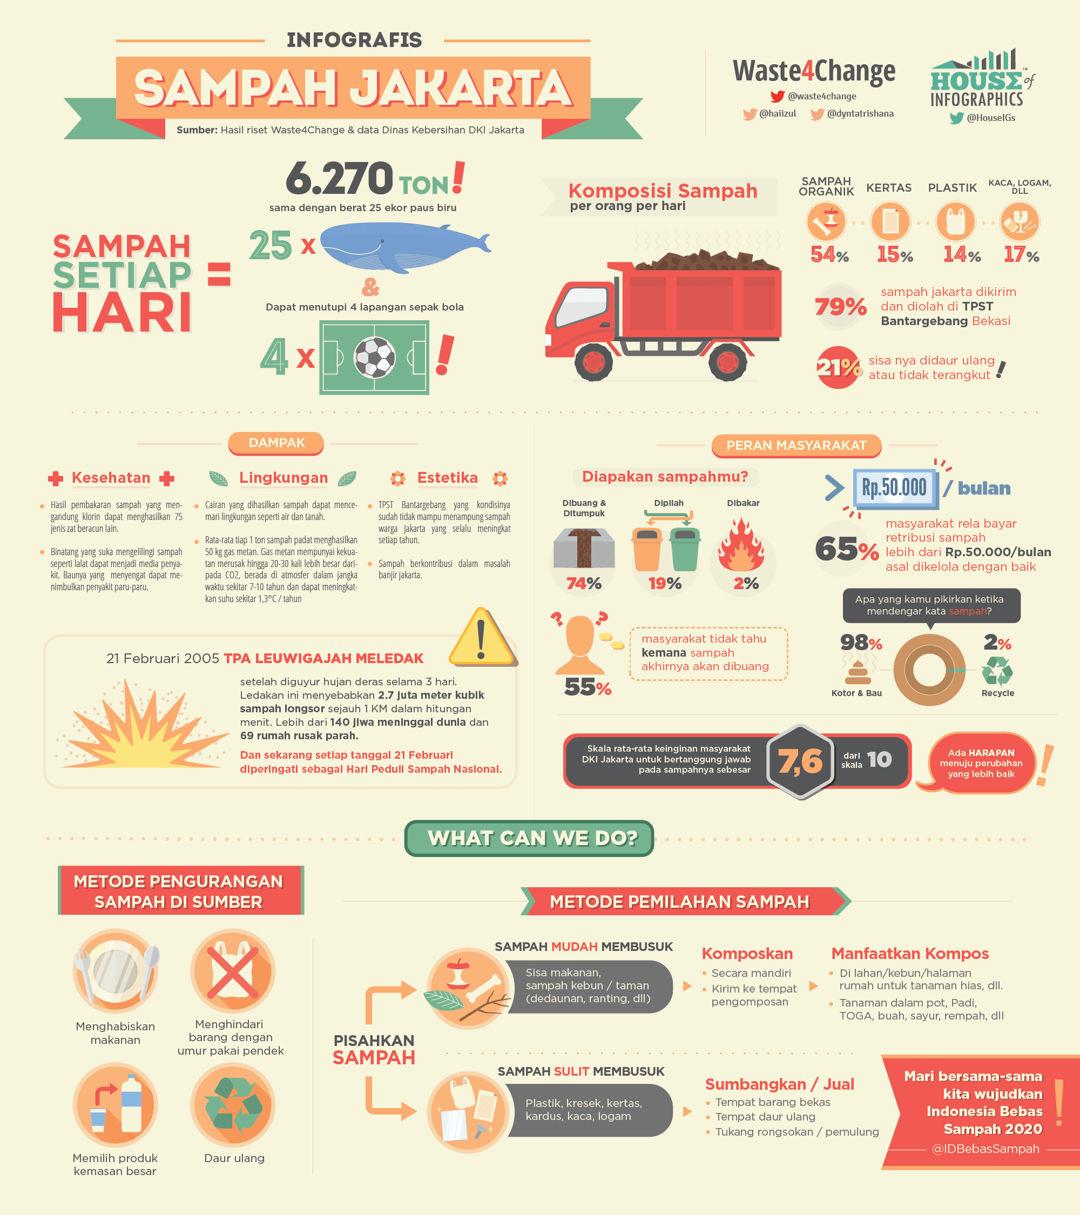 infografis sampah jakarta